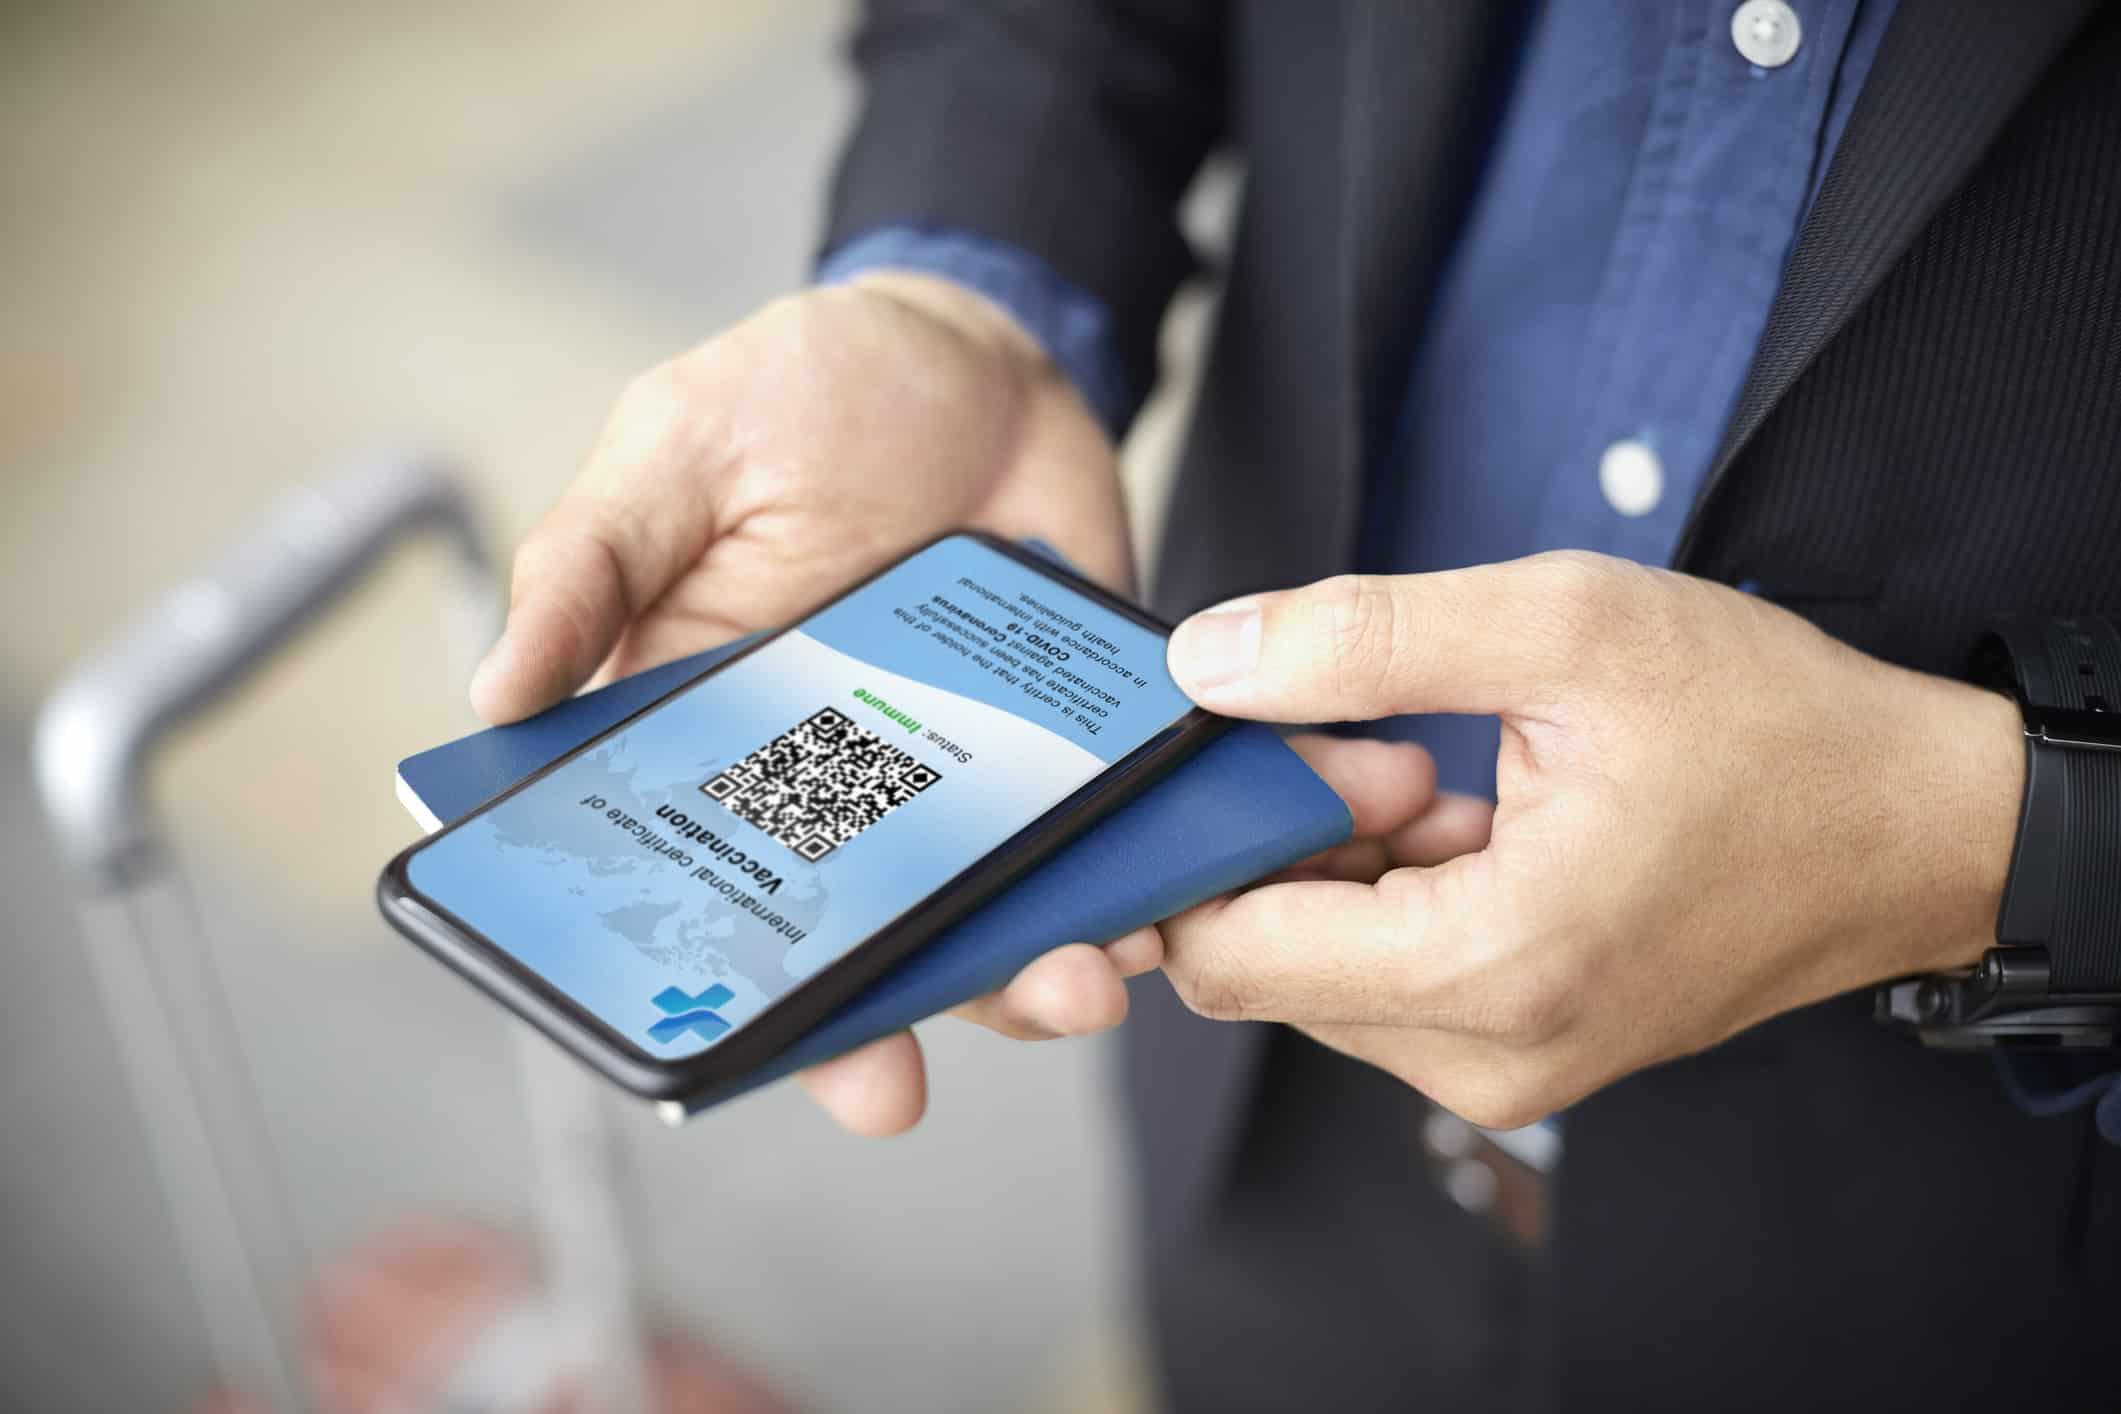 Vaccine passport app leaks users' personal data